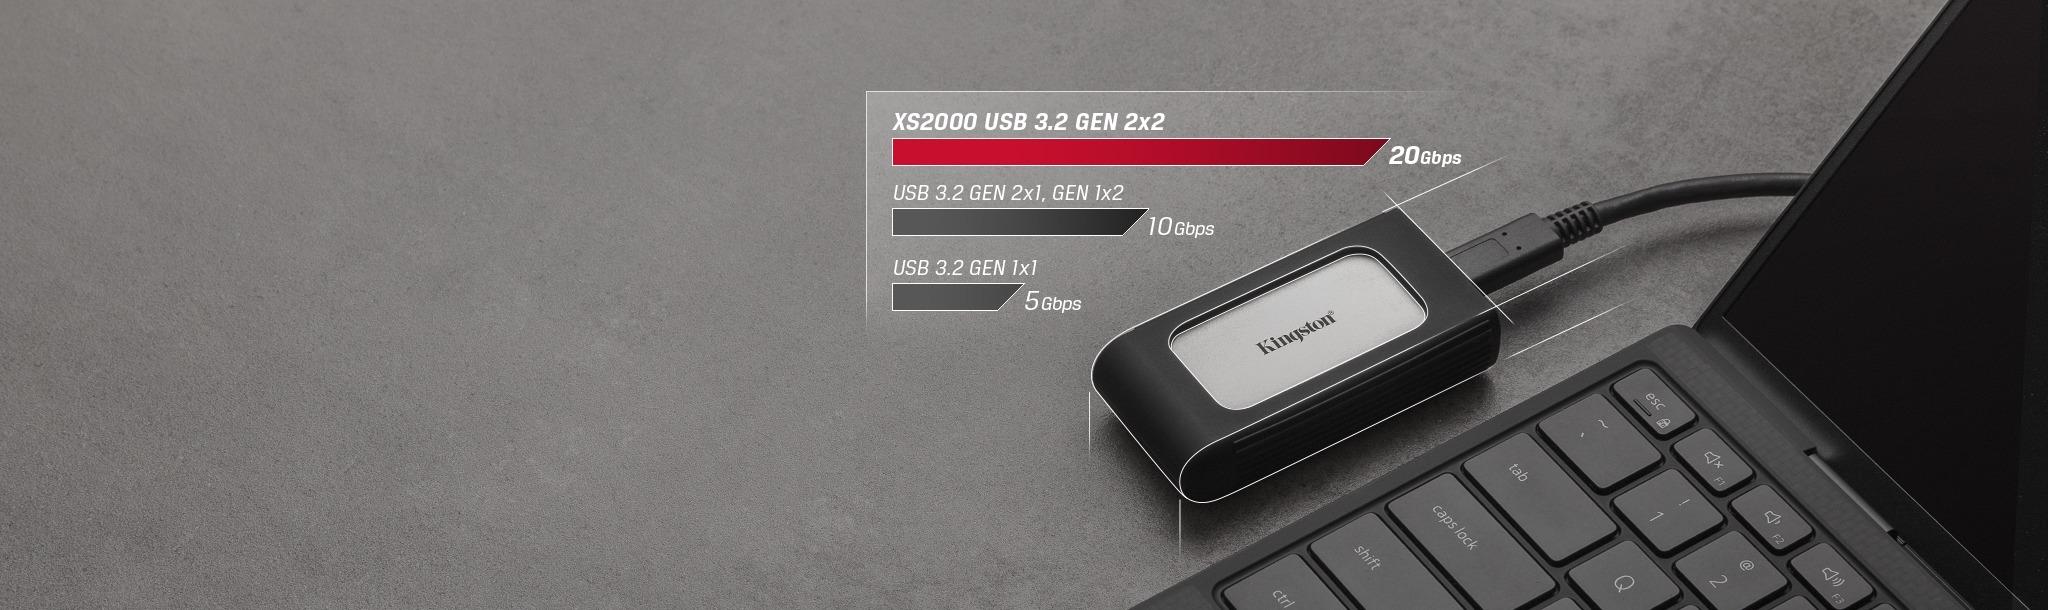 USB 3.2 Gen 2x2 performance